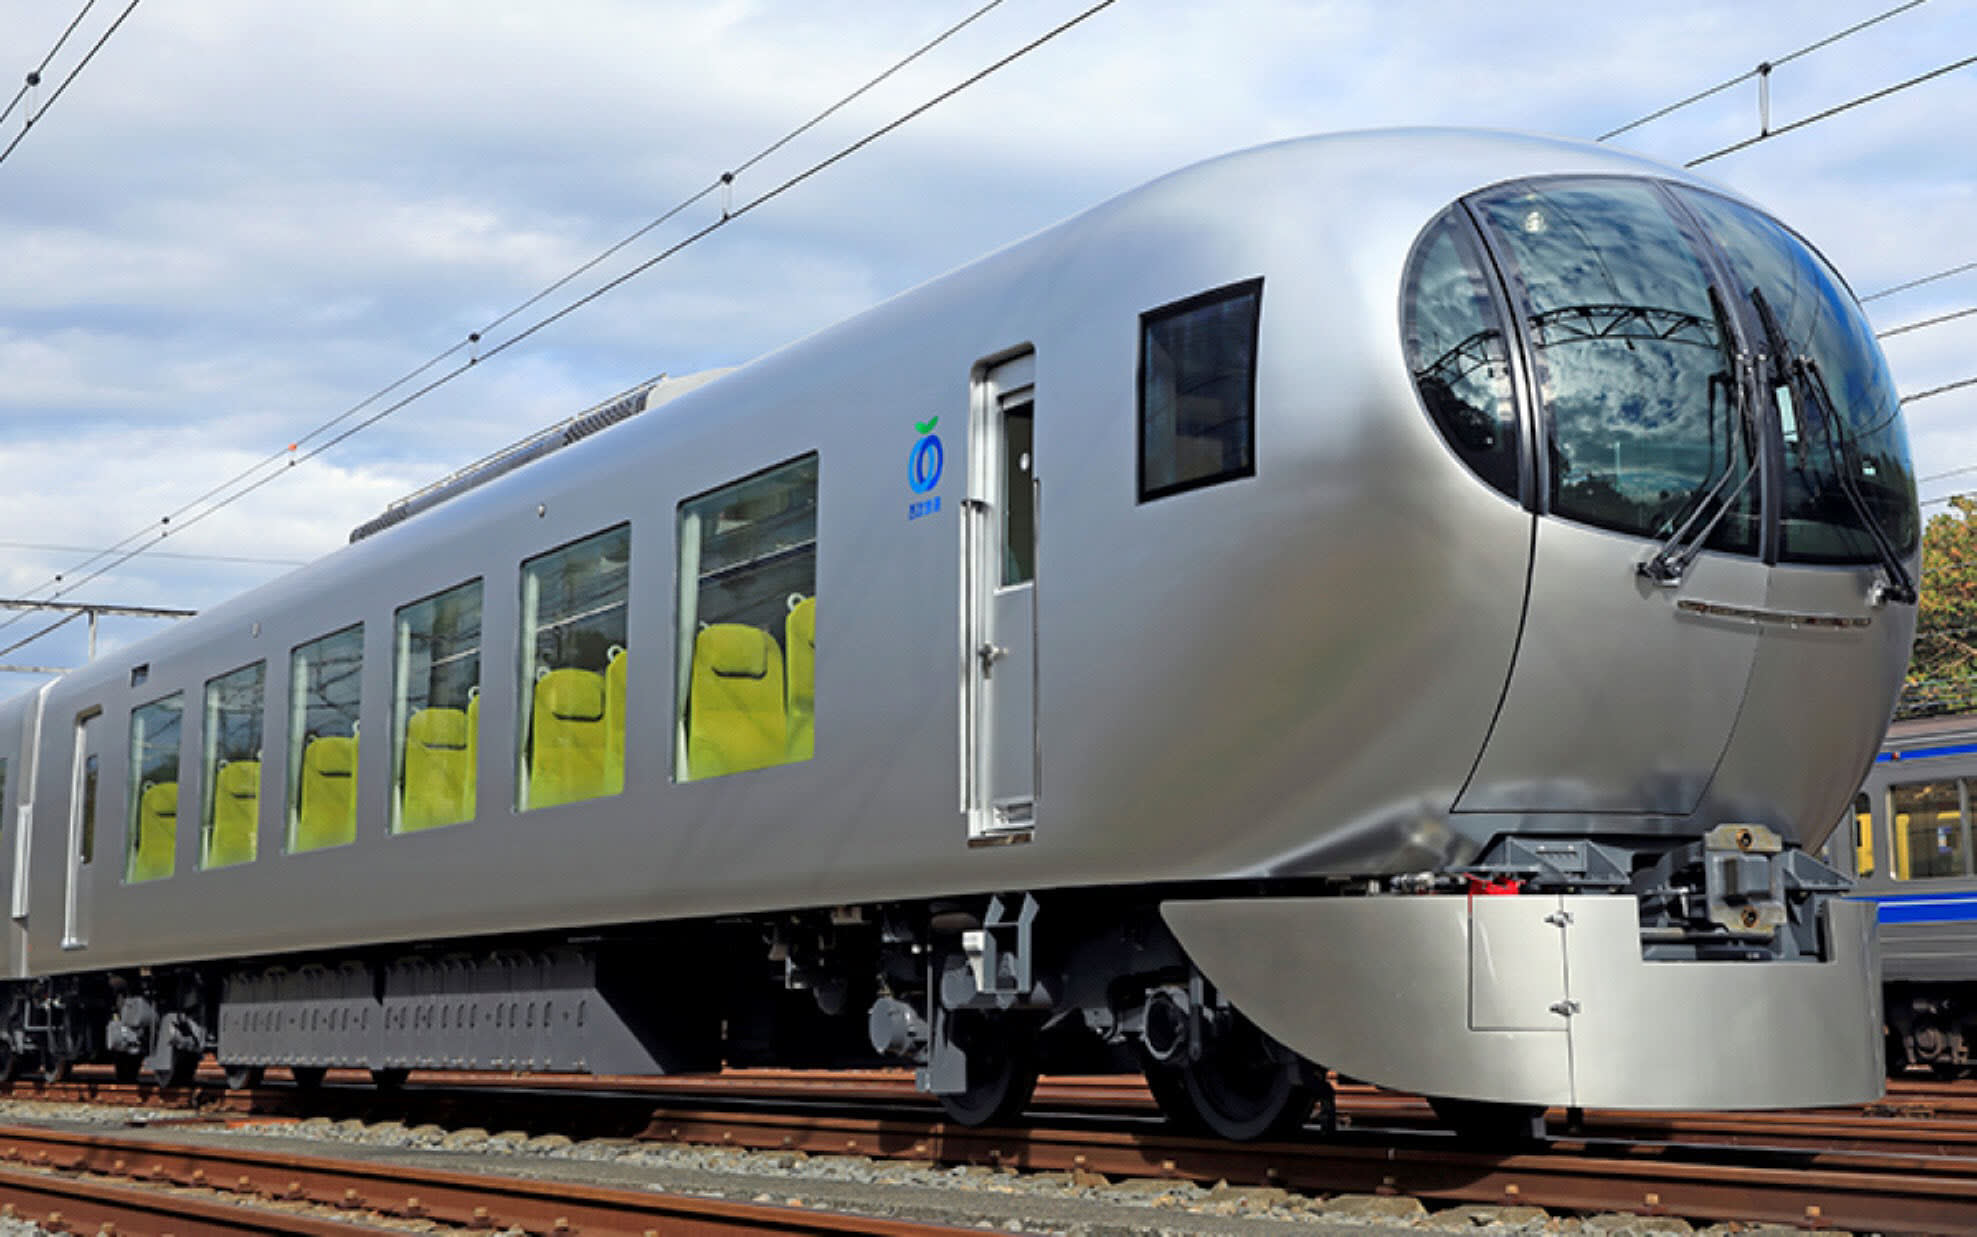 Design on the track: Japan's cutting-edge trains turn heads on cardboard box home designs, container home designs, carriage home designs, train car home designs, rail car dock designs,